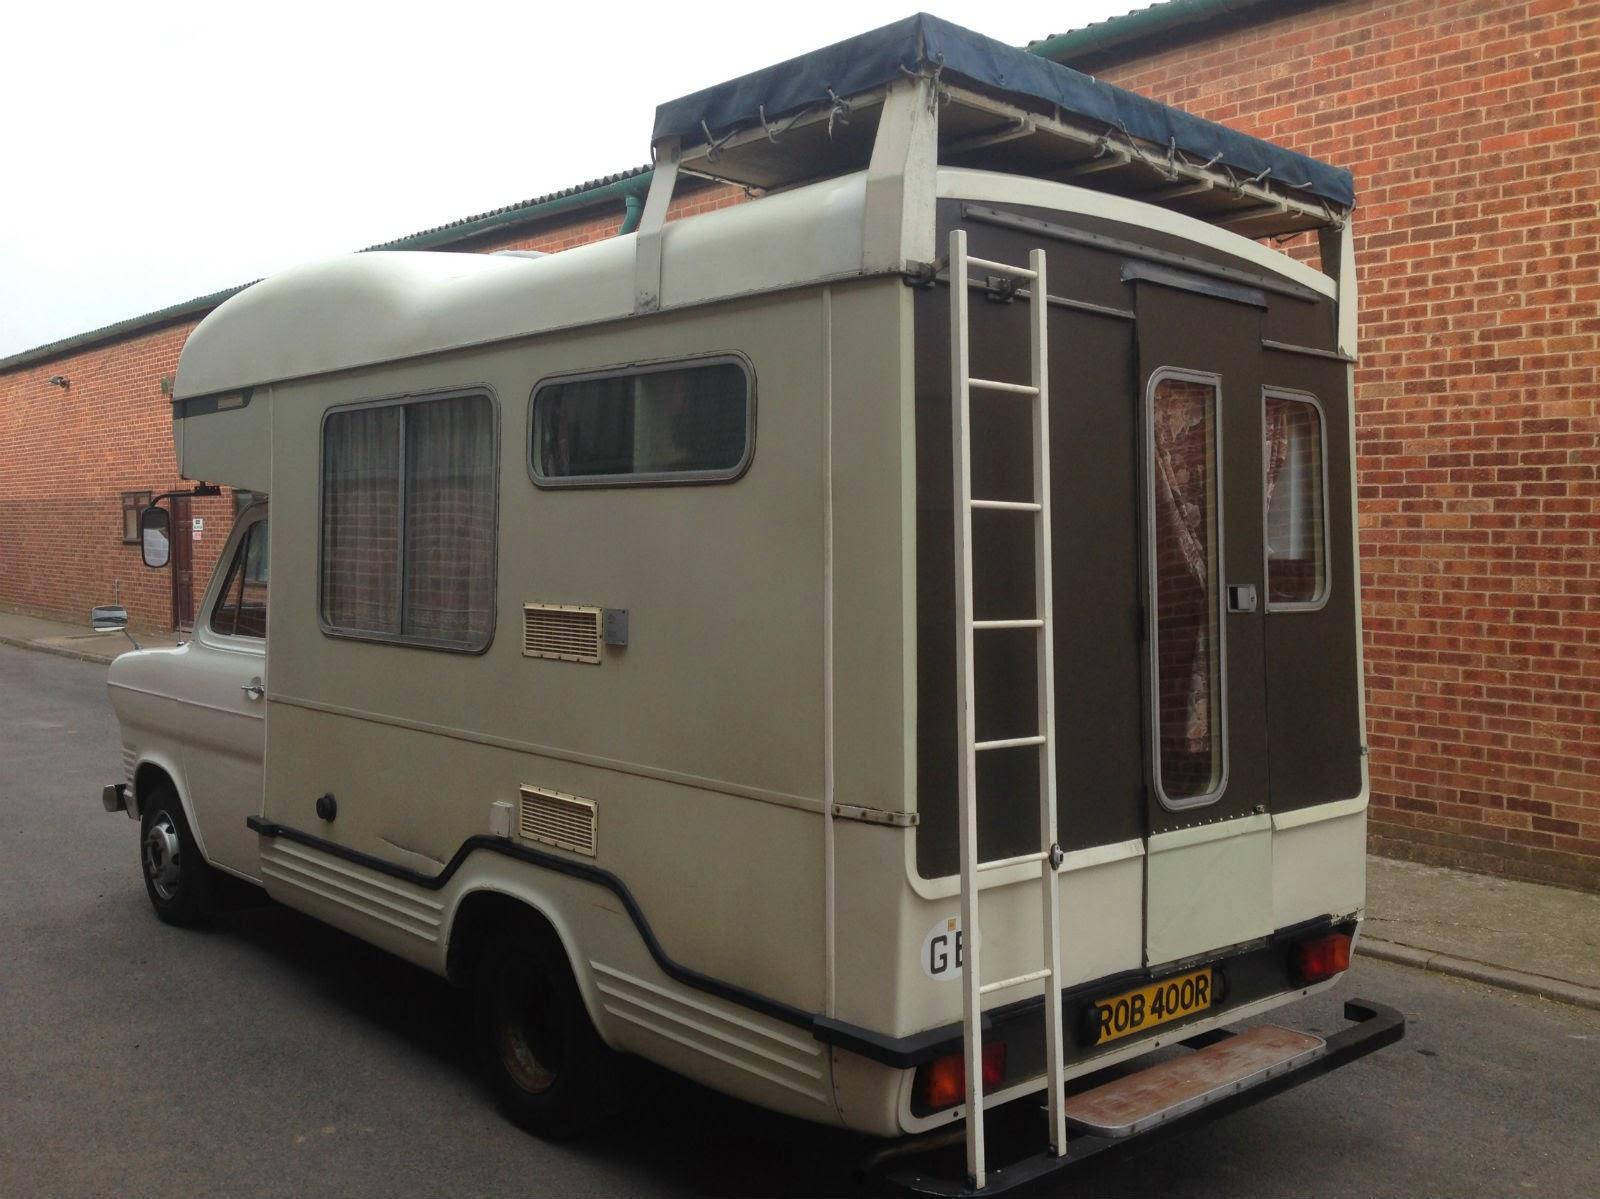 Used Rvs 1977 Ford Transit Mk1 Camper Motorhome For Sale